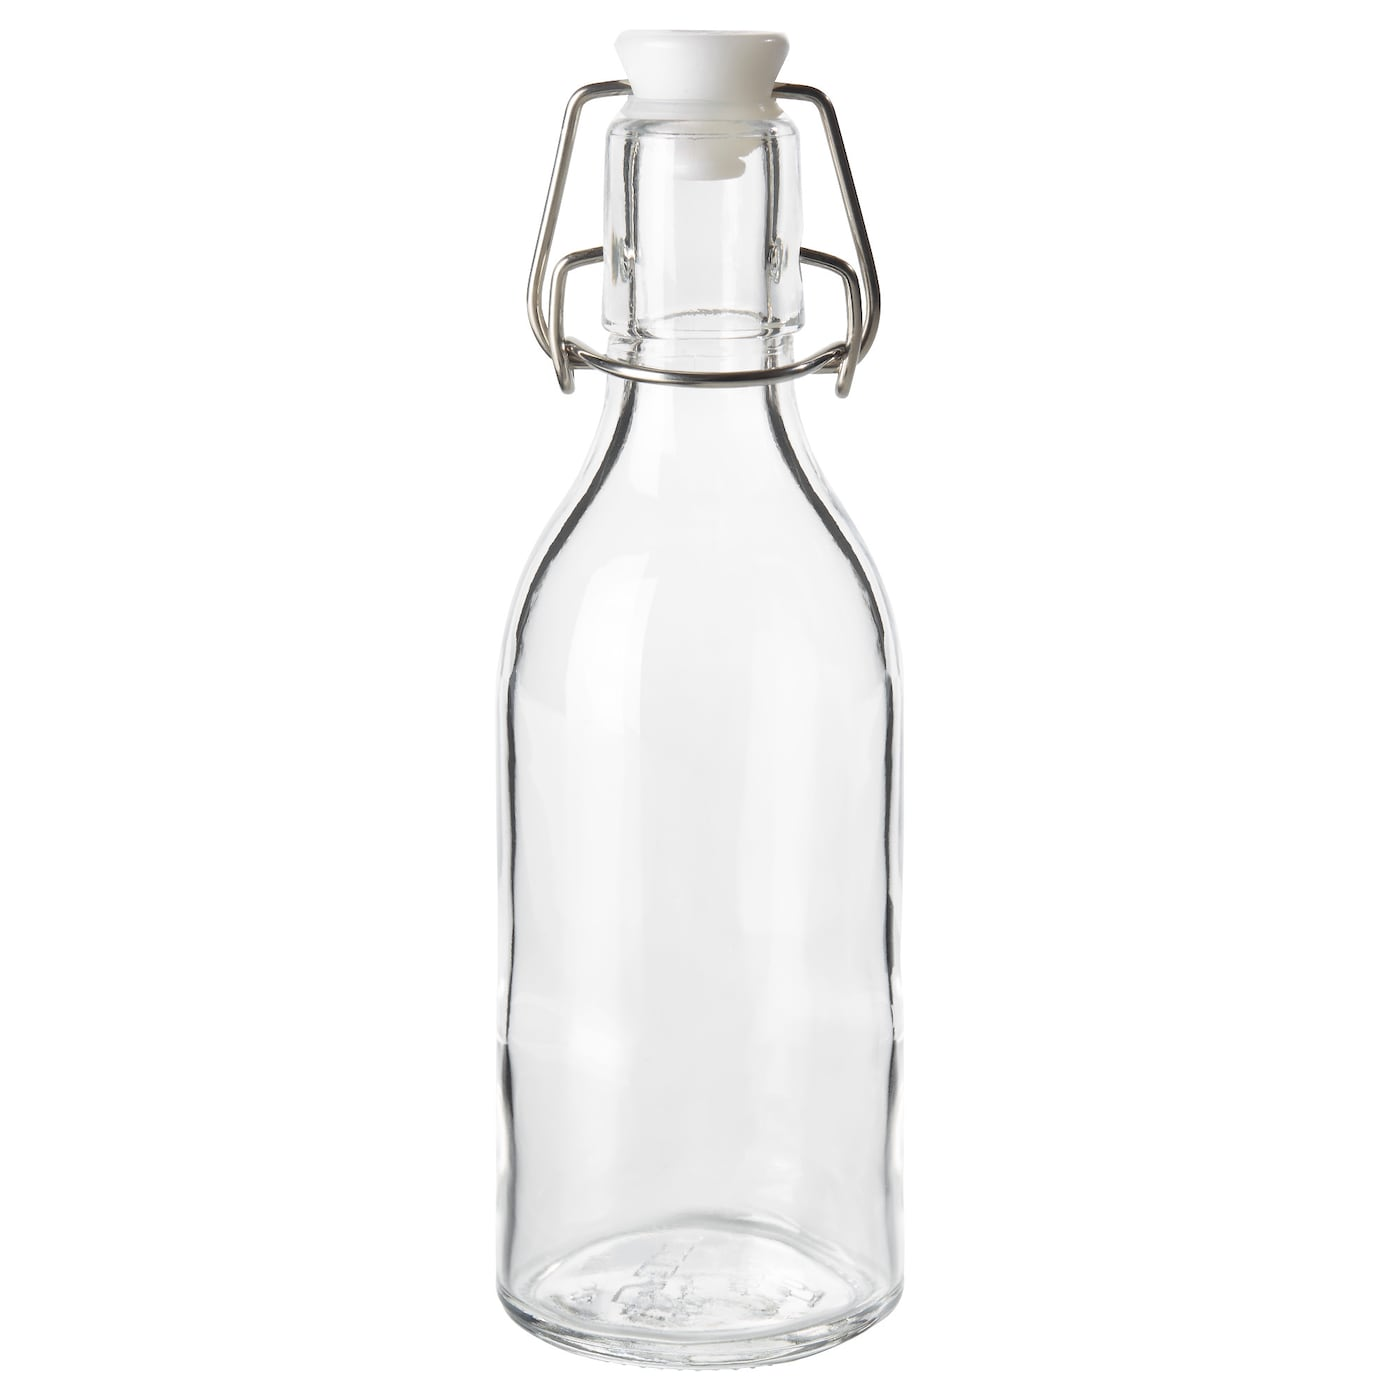 1 Gallon Empty Bottle